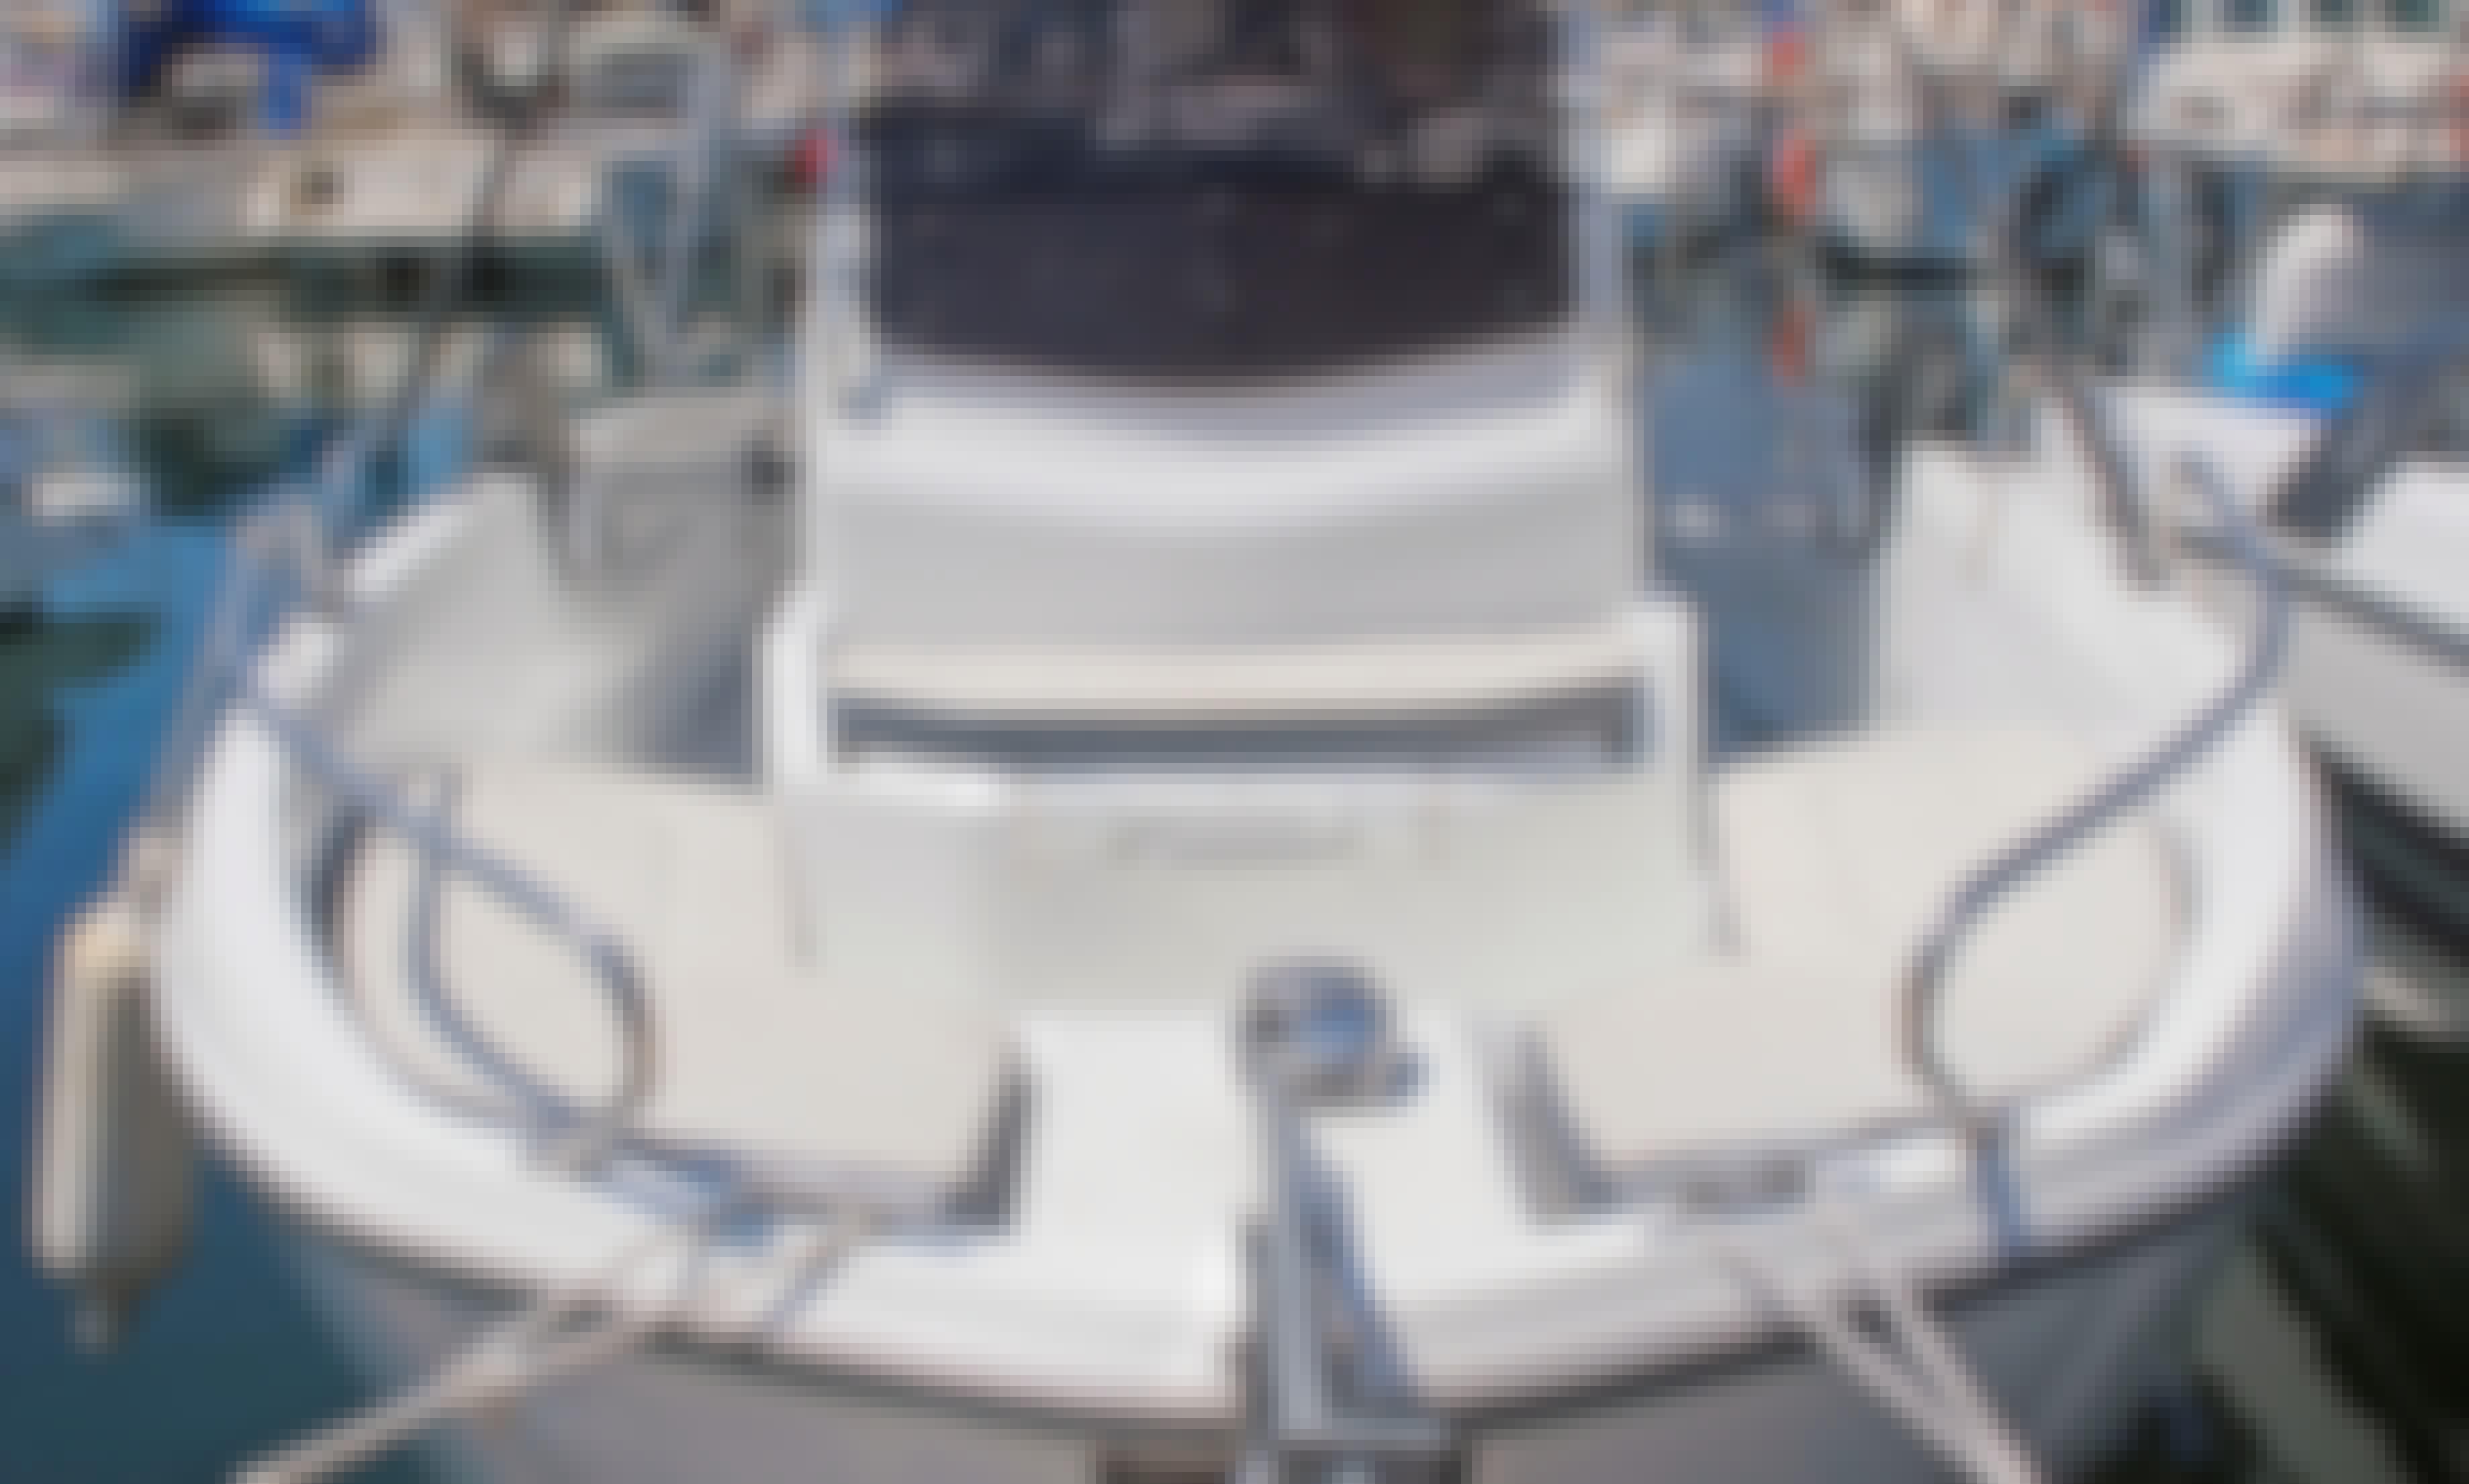 Rent 2016 Beneteau Flyer 6.6 Spacedeck in L'estartit, Costa Brava